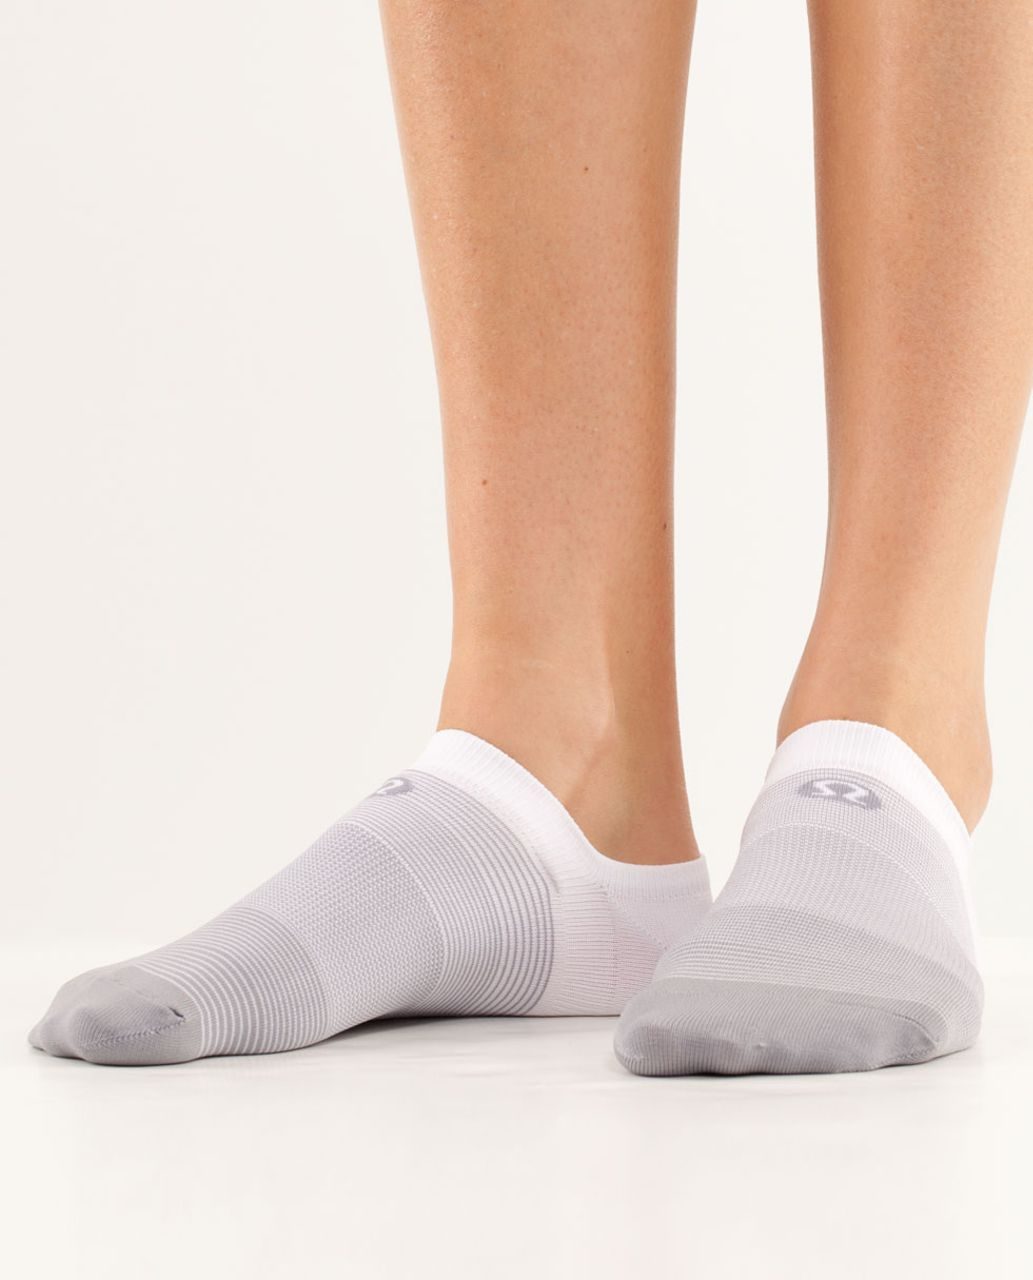 Lululemon Women's Featherweight Sock - Fossil White Gradient